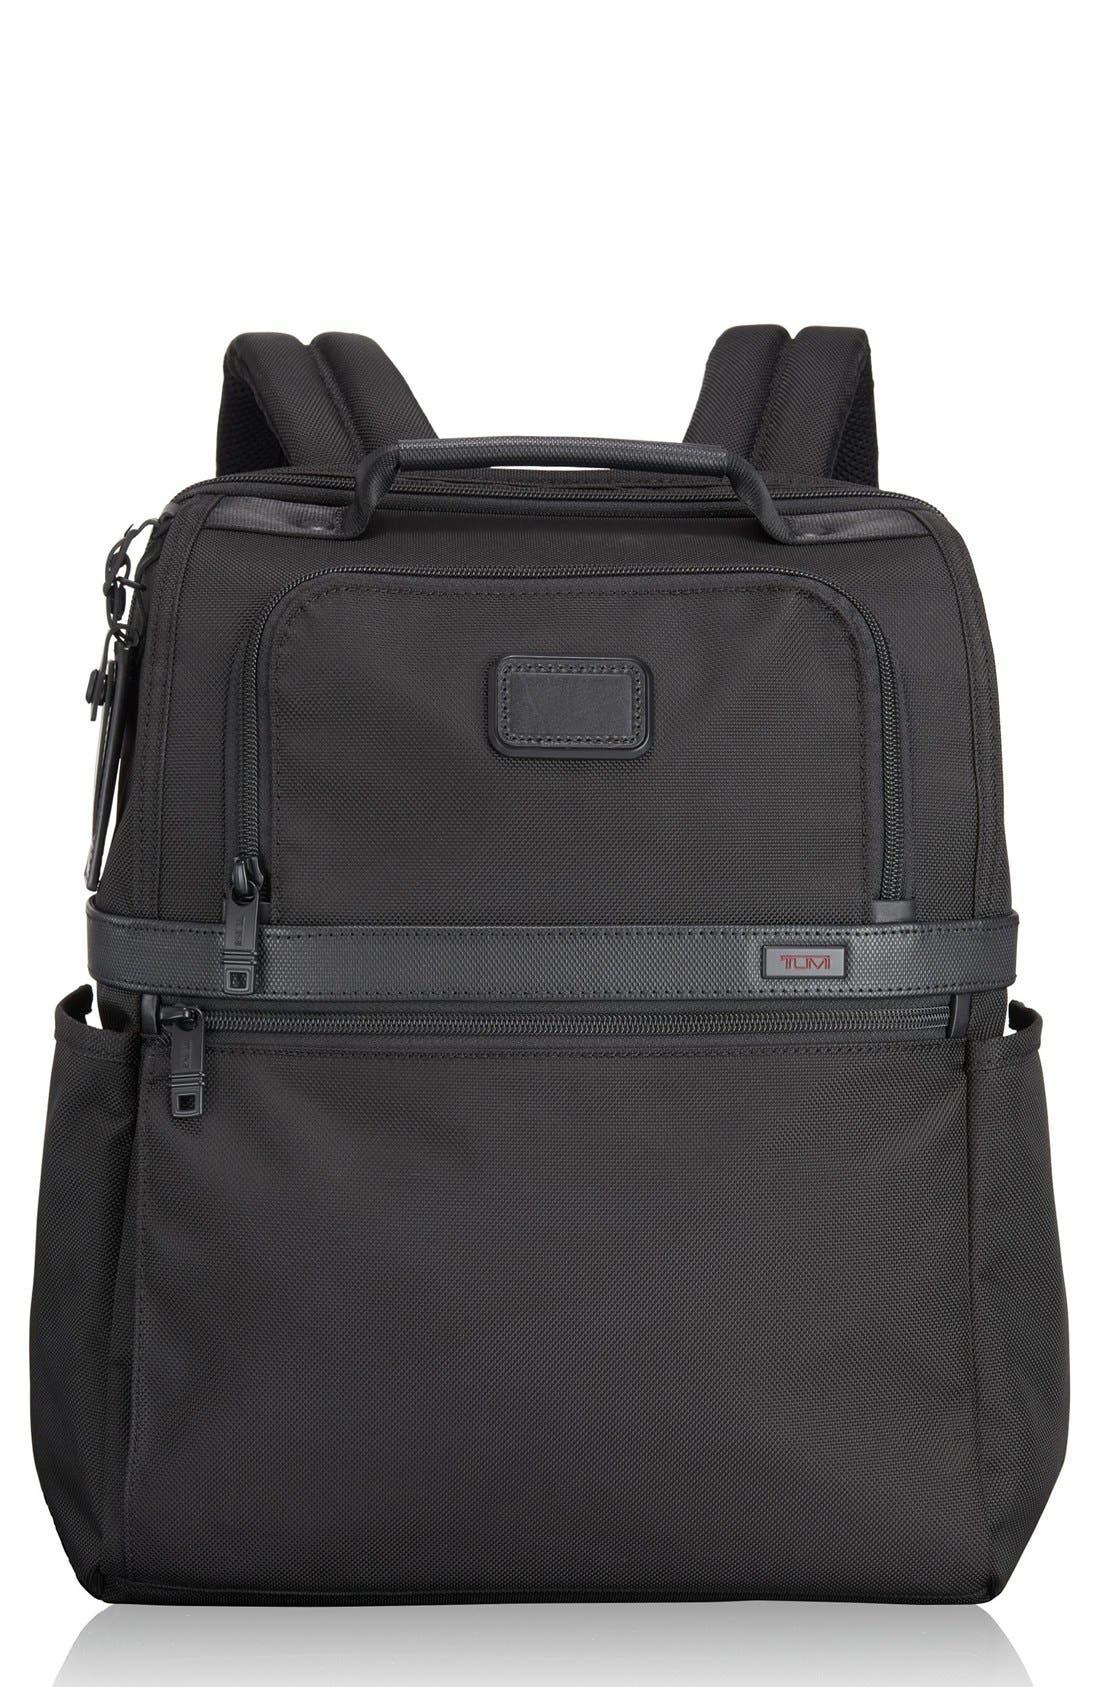 Alternate Image 1 Selected - Tumi Slim Solutions Briefpack